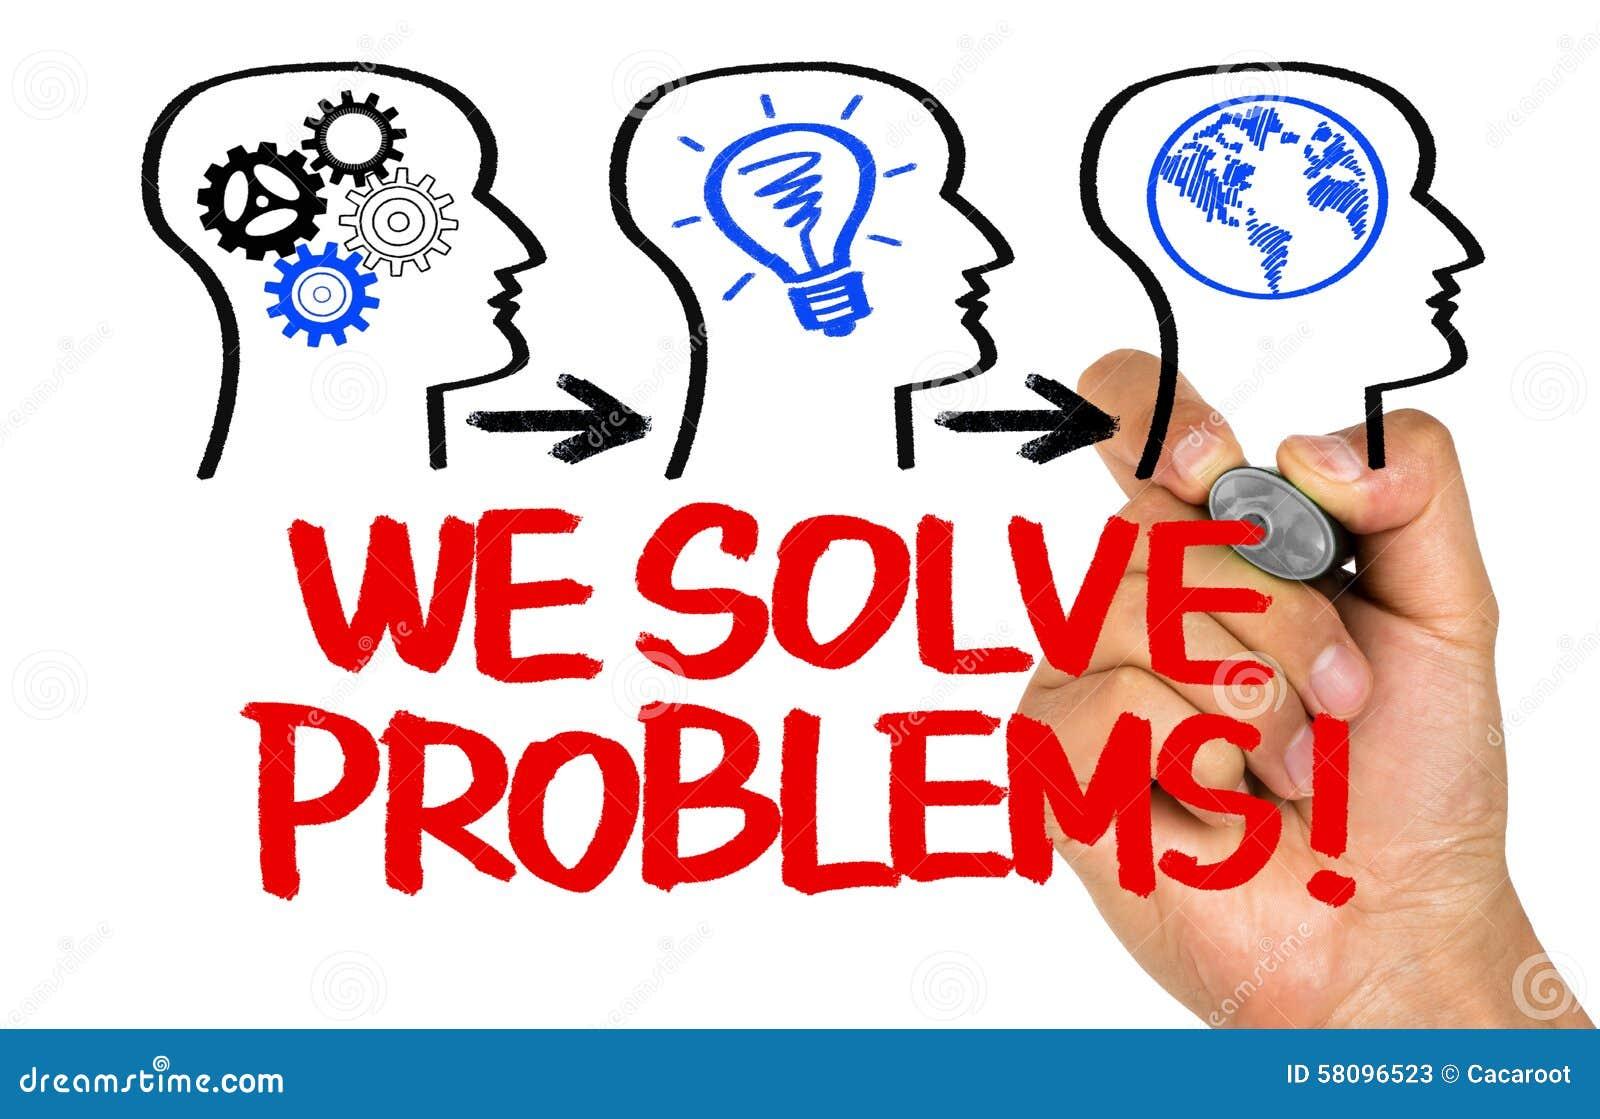 17b8ab5b7b967c We solve problems stock image. Image of creative